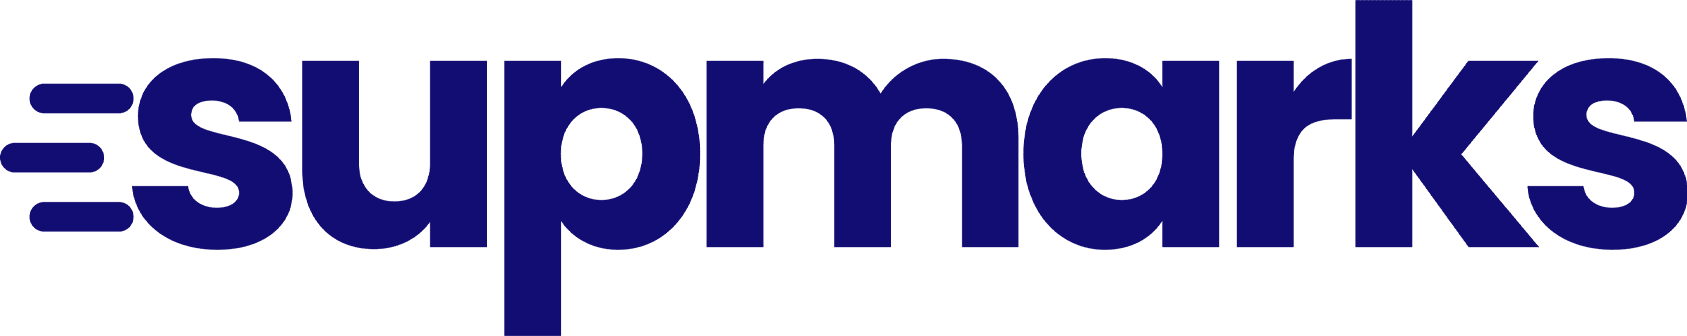 Supmarks logo